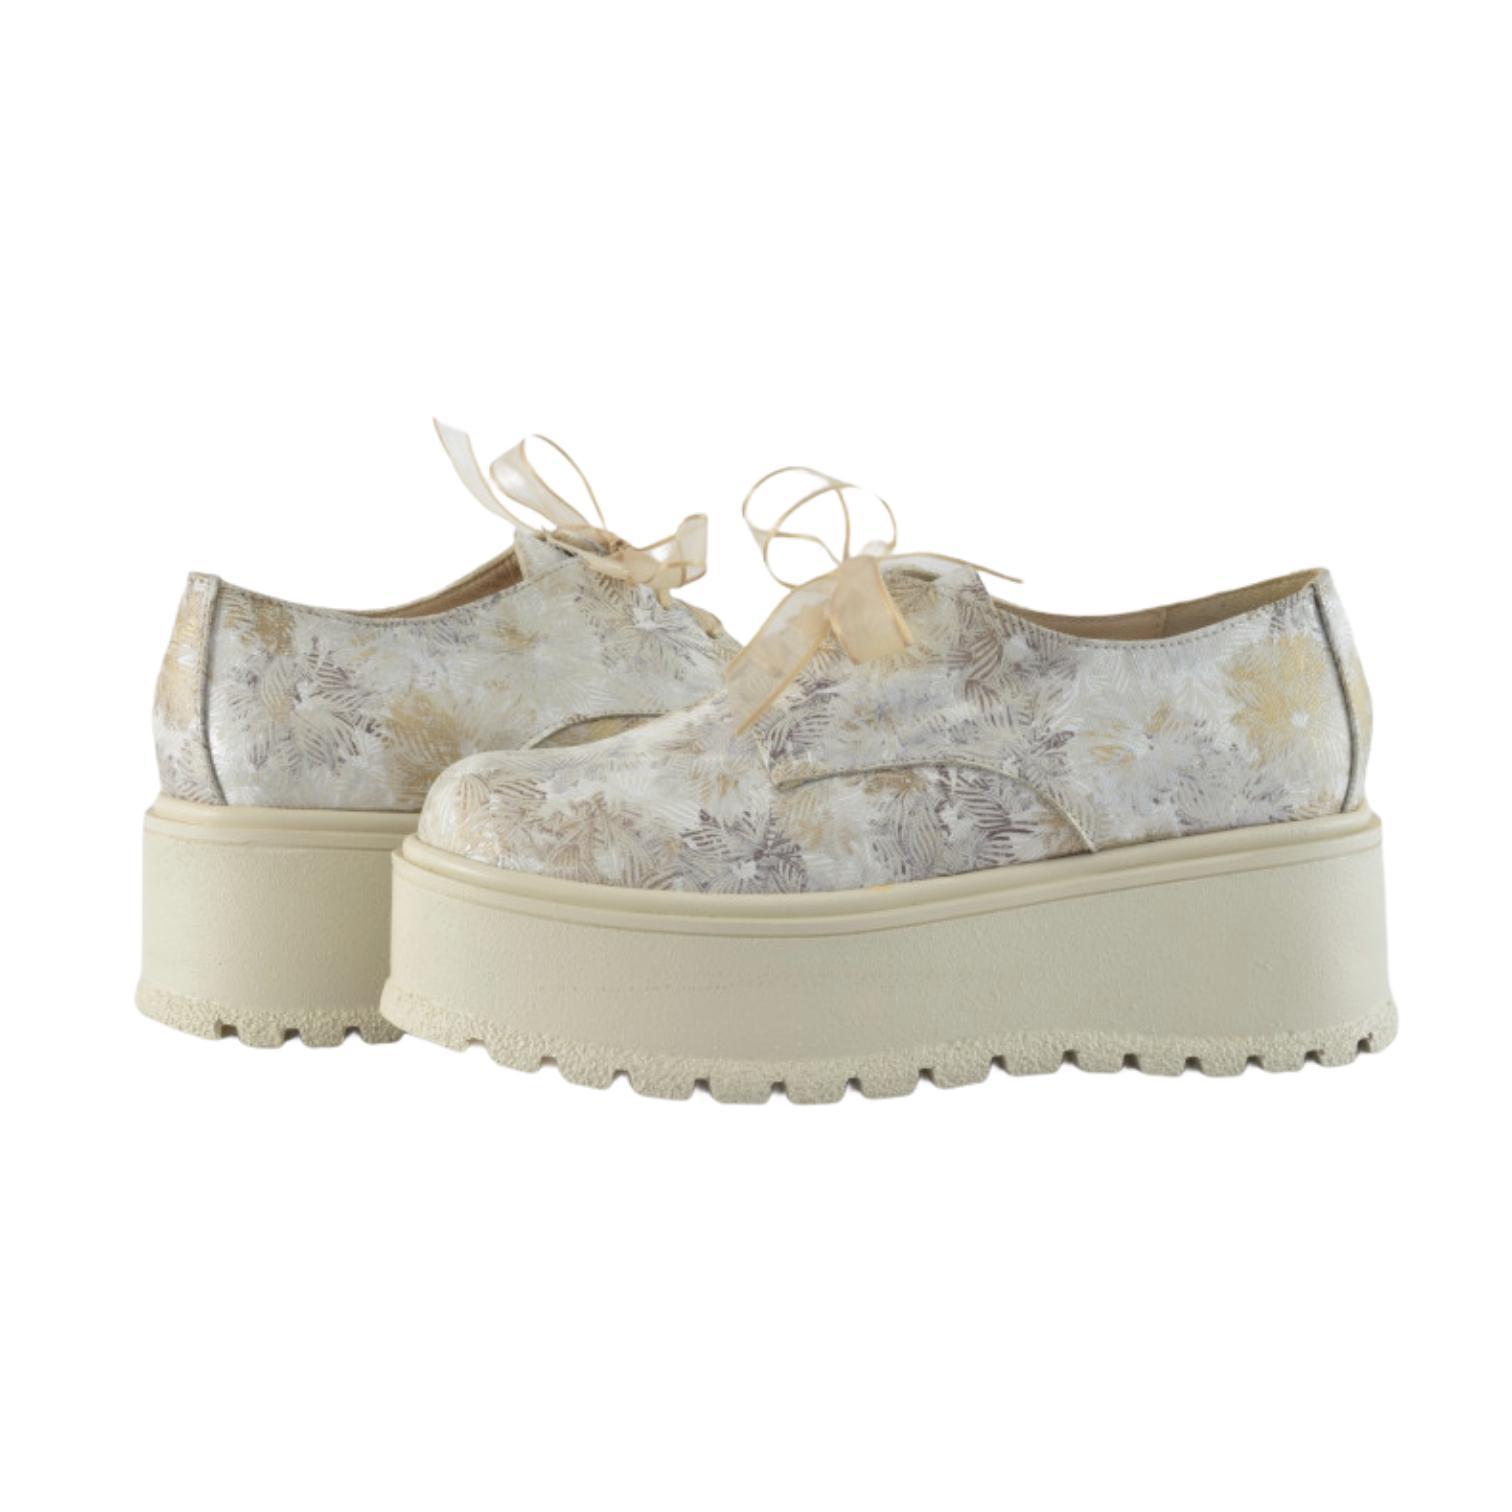 Pantofi aurii cu imprimeu floral